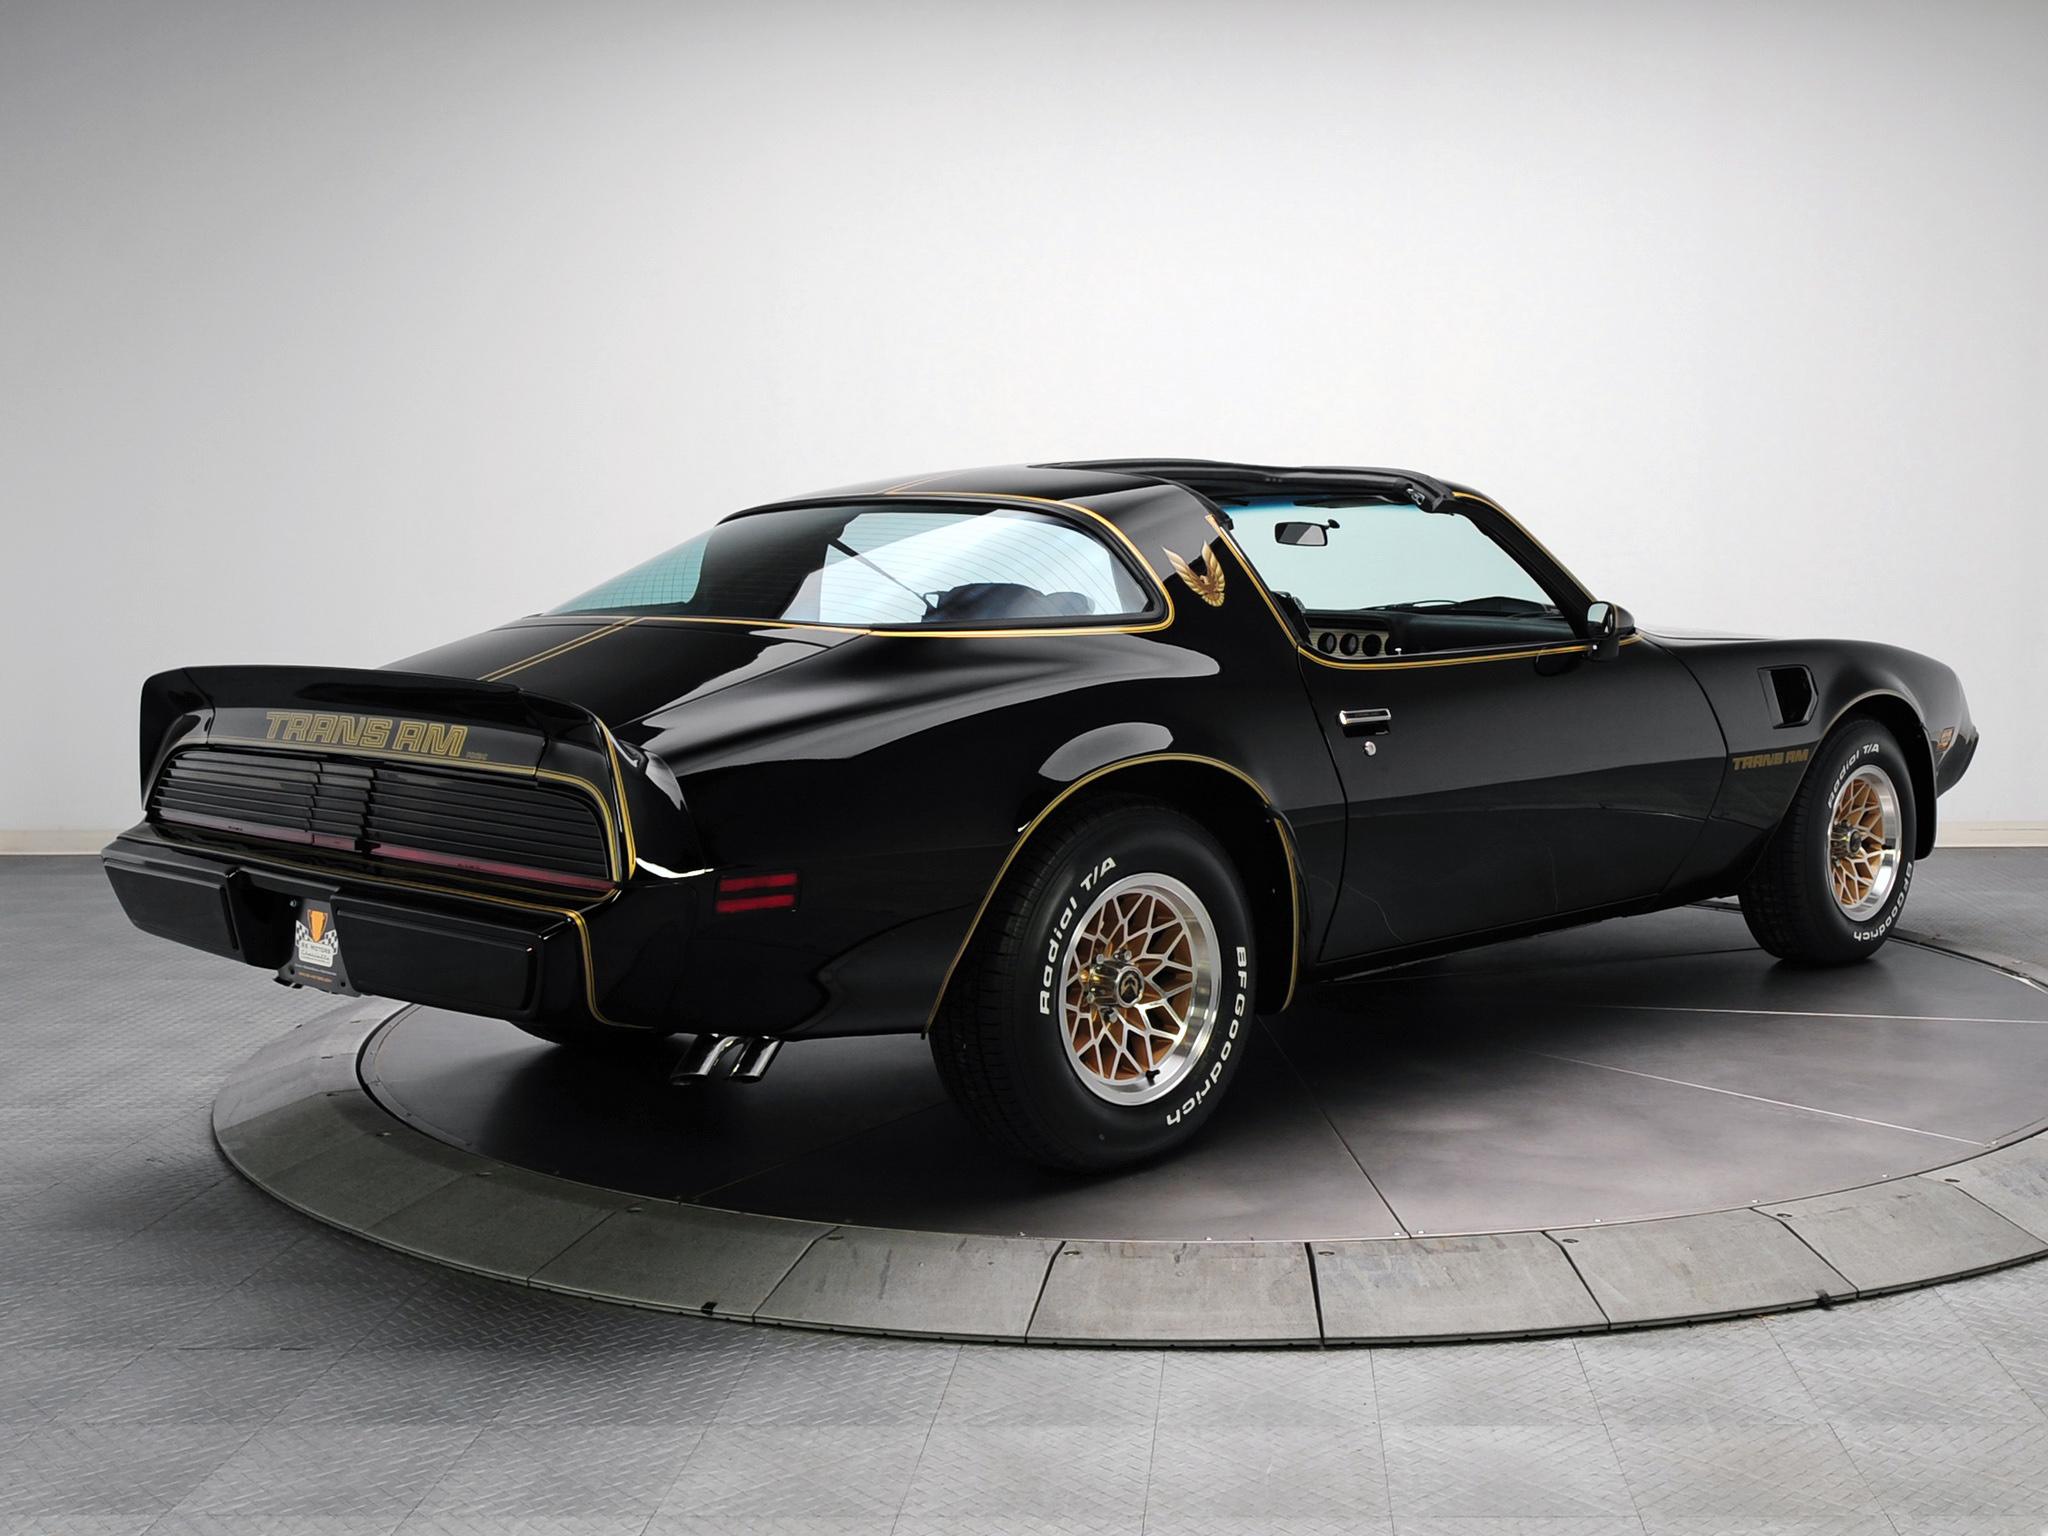 1979 Pontiac Firebird Trans Am T A 6 6 L78 S E muscle classic daytona 2048x1536